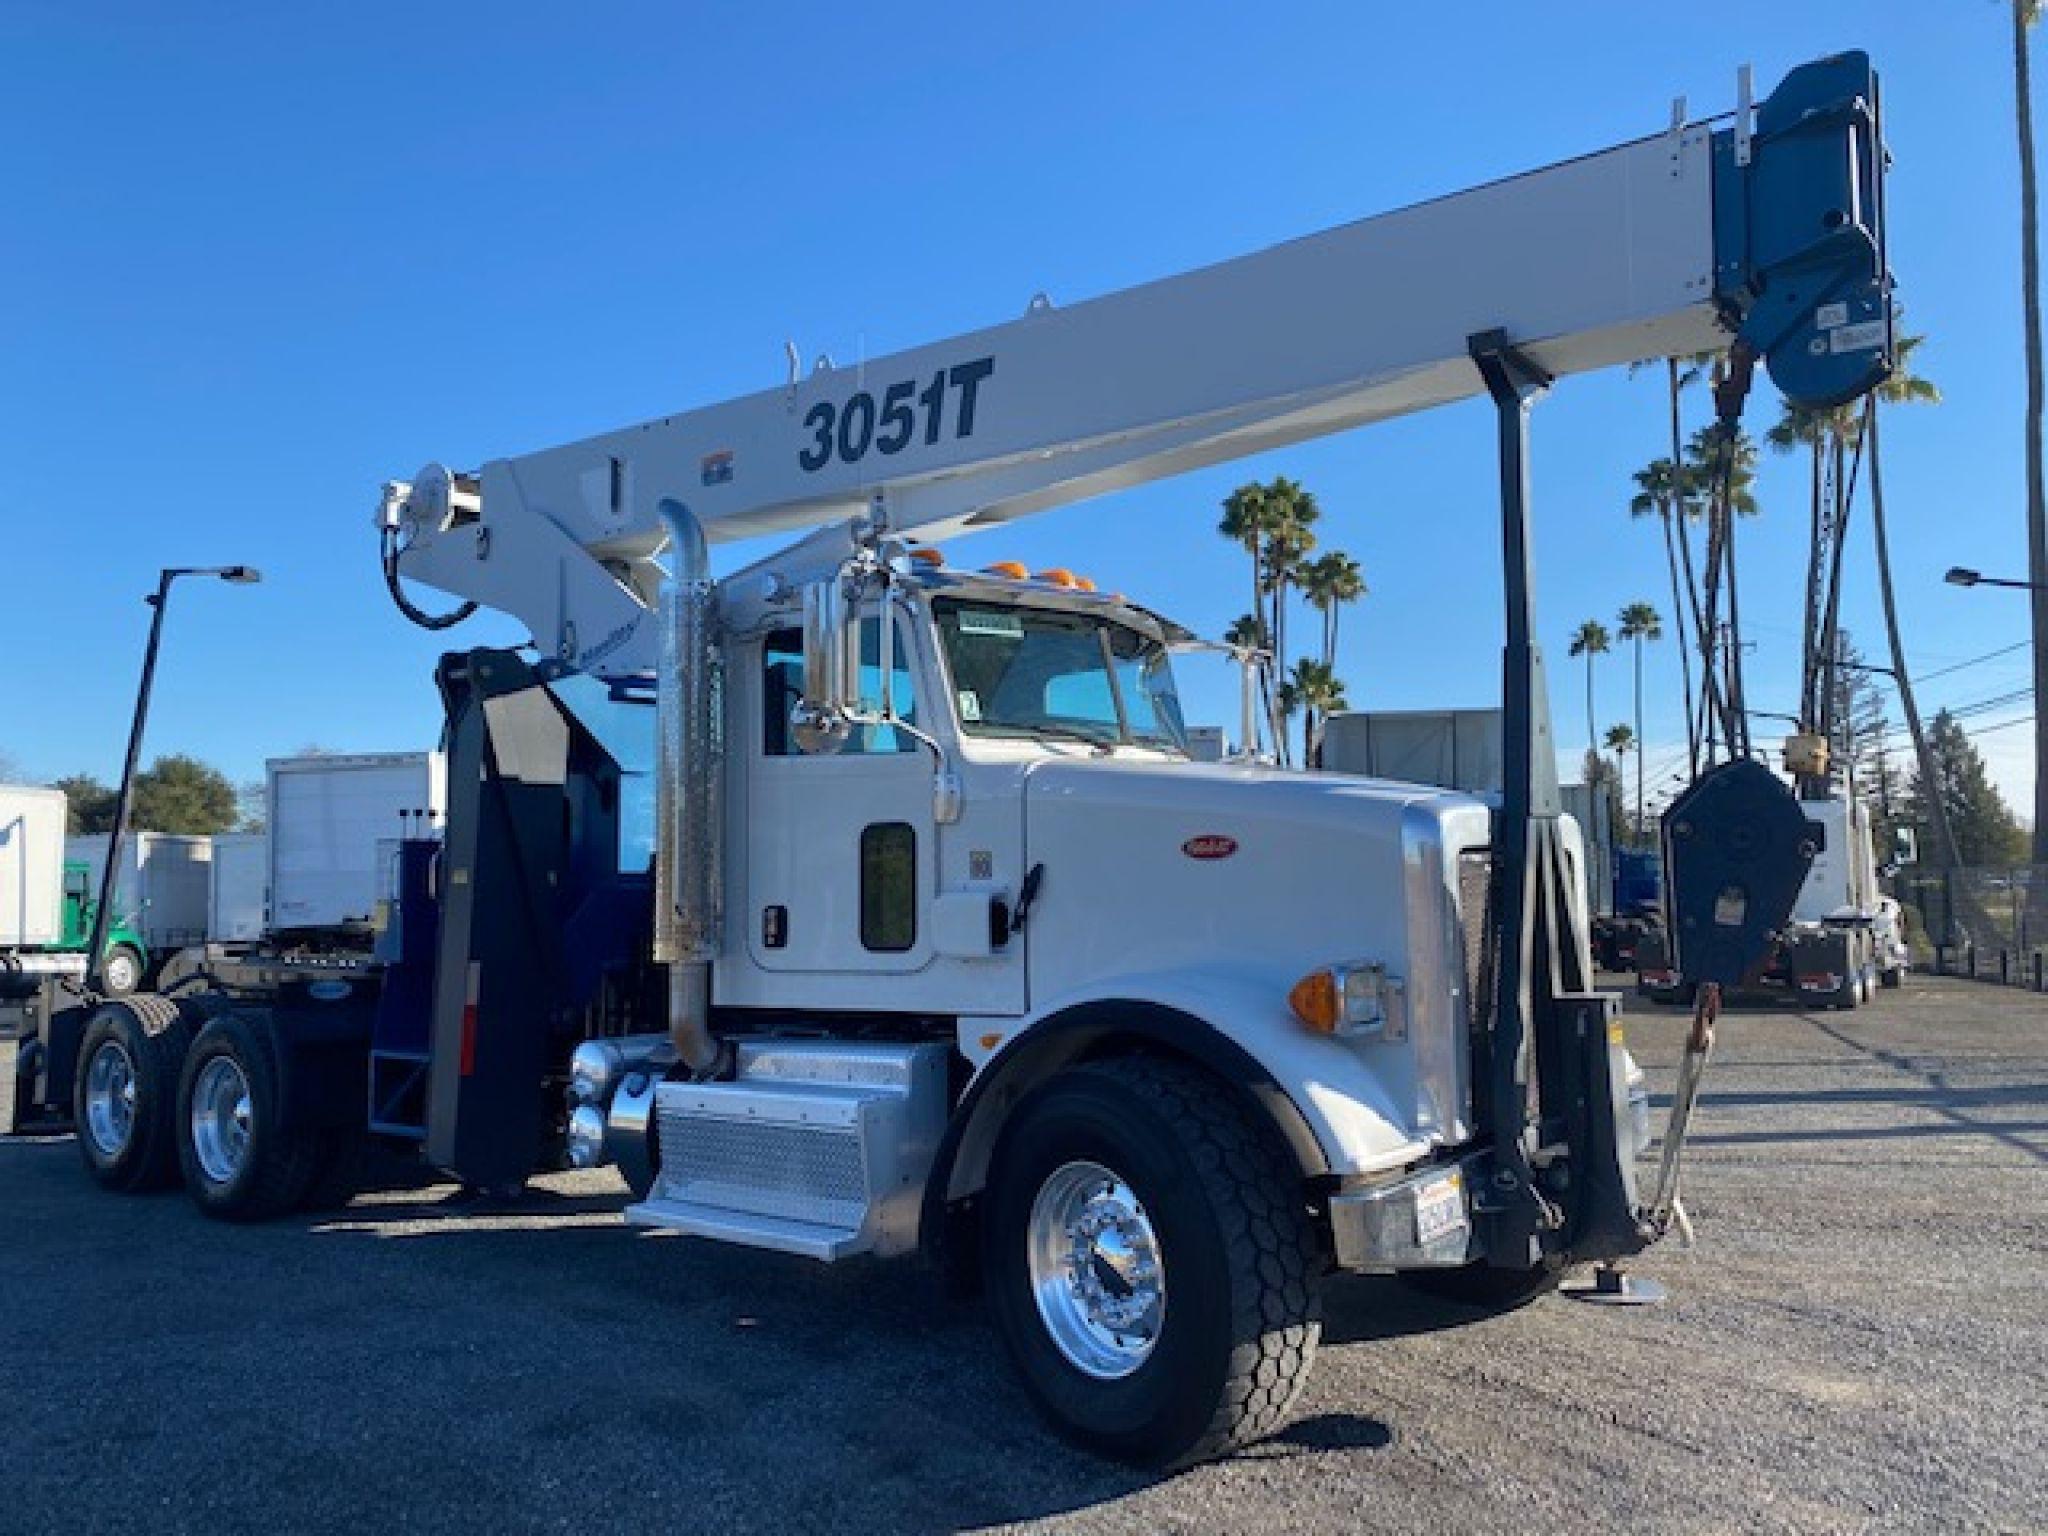 2015 Peterbilt 365 Crane Truck For Sale With MANITEX 3051T Crane